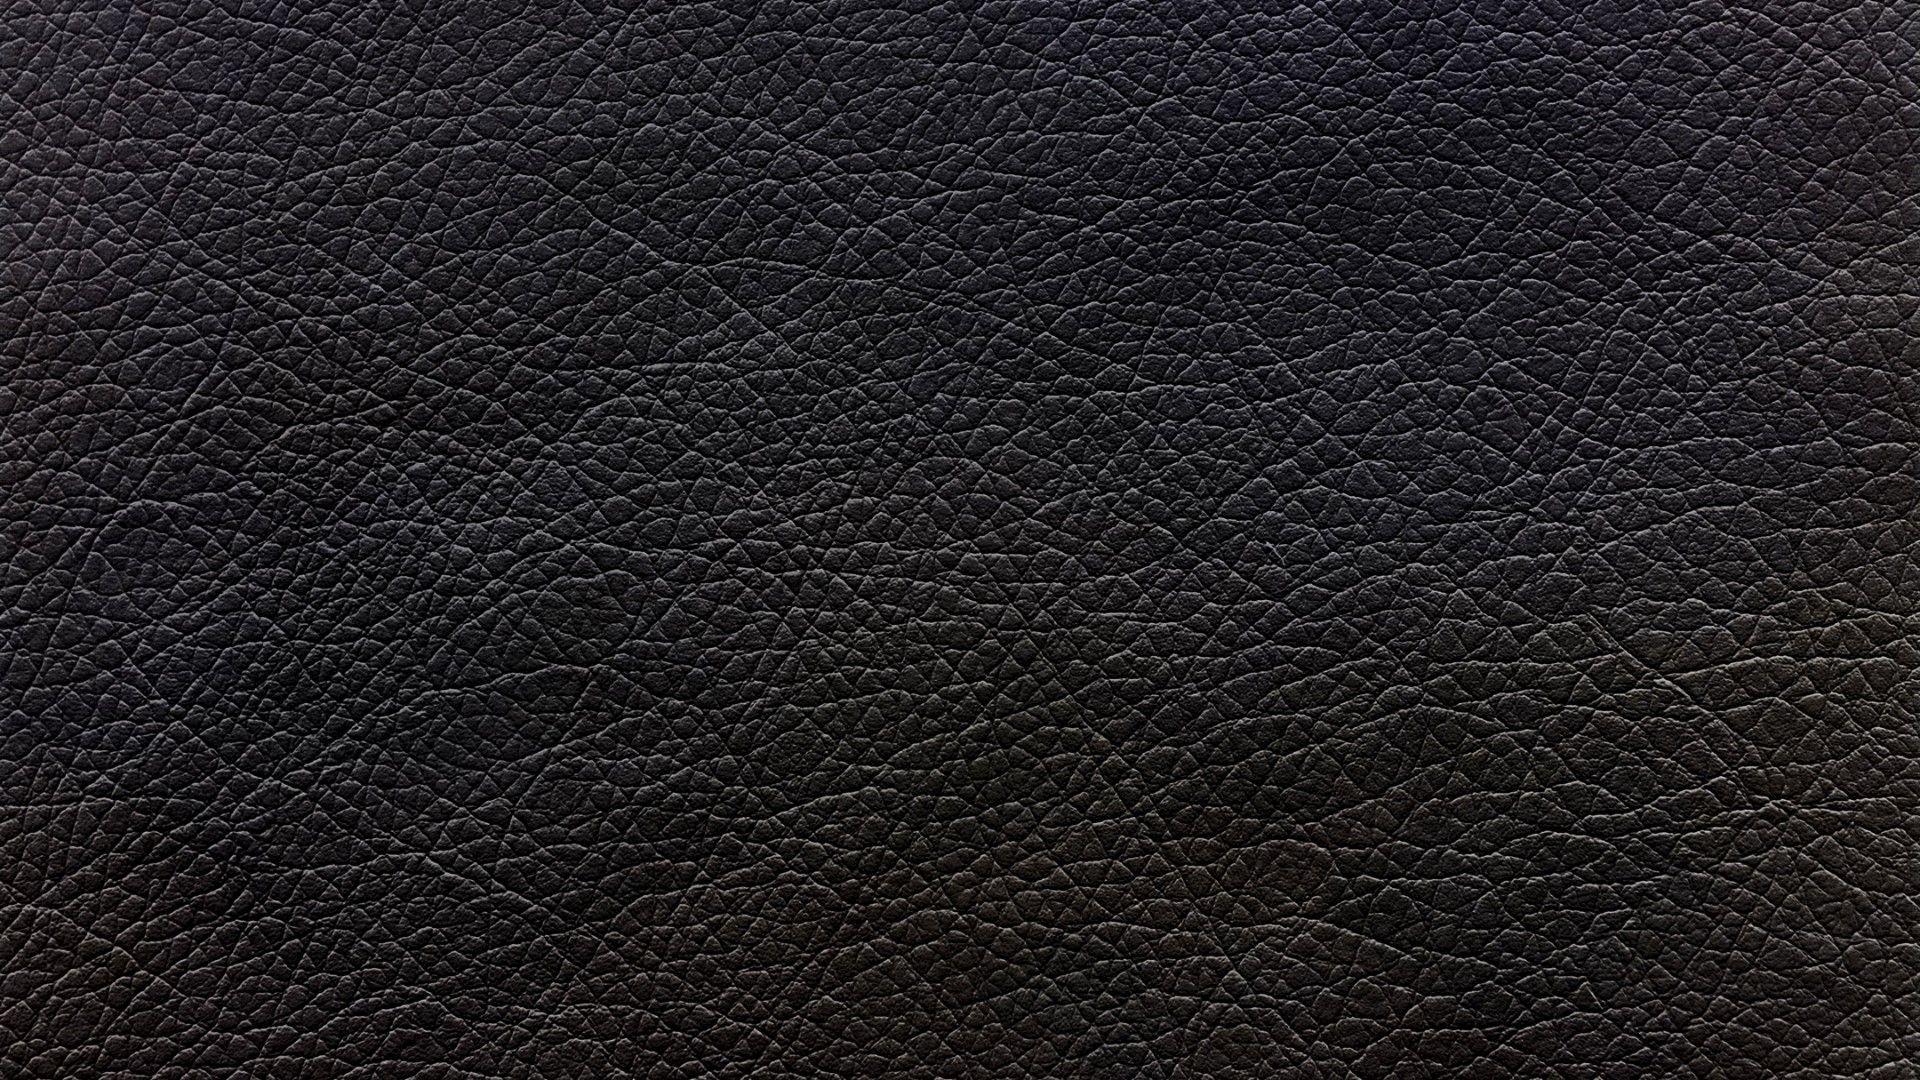 Benefits Of Using Leather Wallpaper – Innovative wallpaper Design Ideas